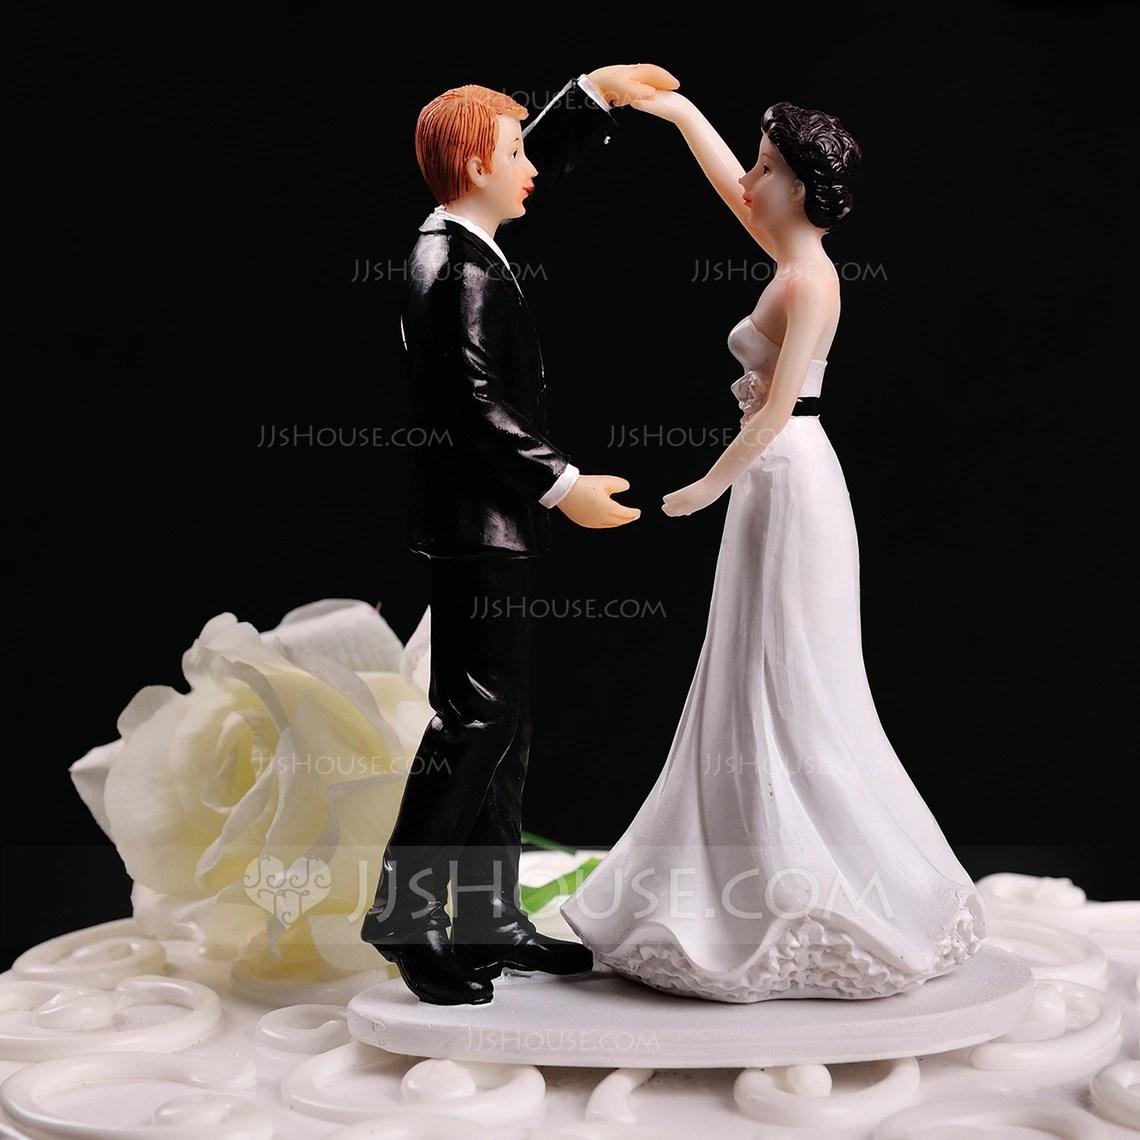 Figurine Dancing Couple Resin Wedding Cake Topper